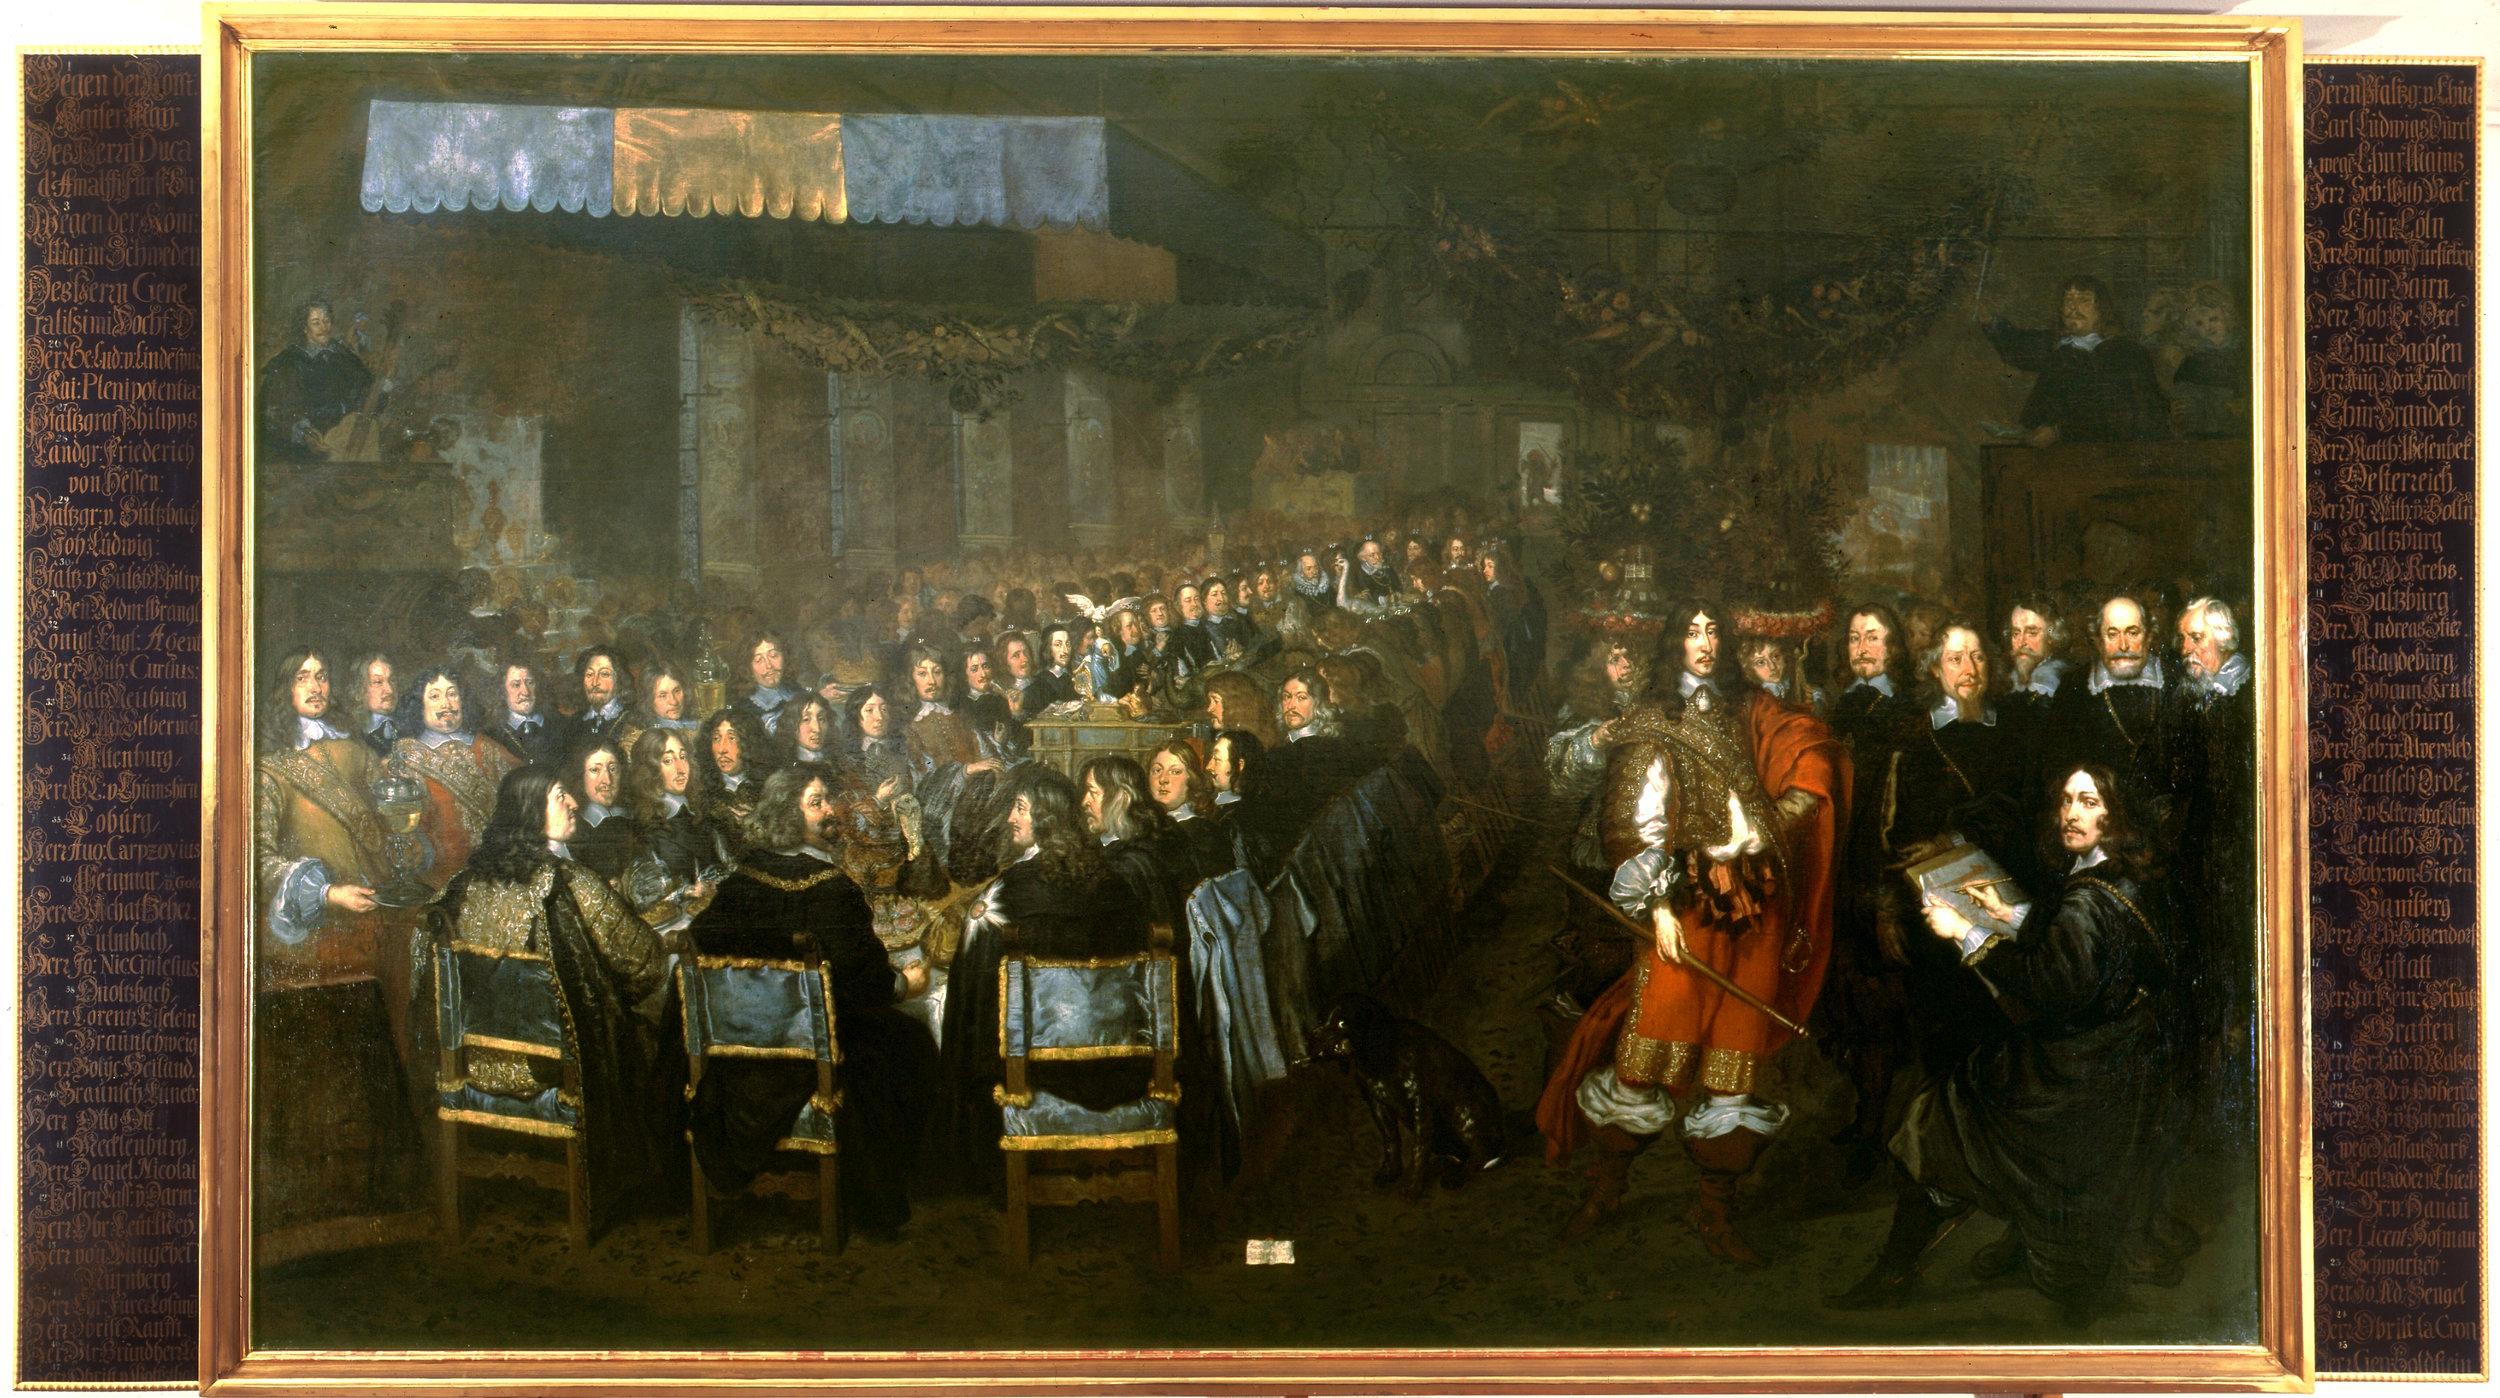 Joachim von Sandrart d. Ä.: Das Friedensmahl im großen Rathaussaal zu Nürnberg am 25.9.1649. Foto: Museen der Stadt Nürnberg, Kunstsammlungen